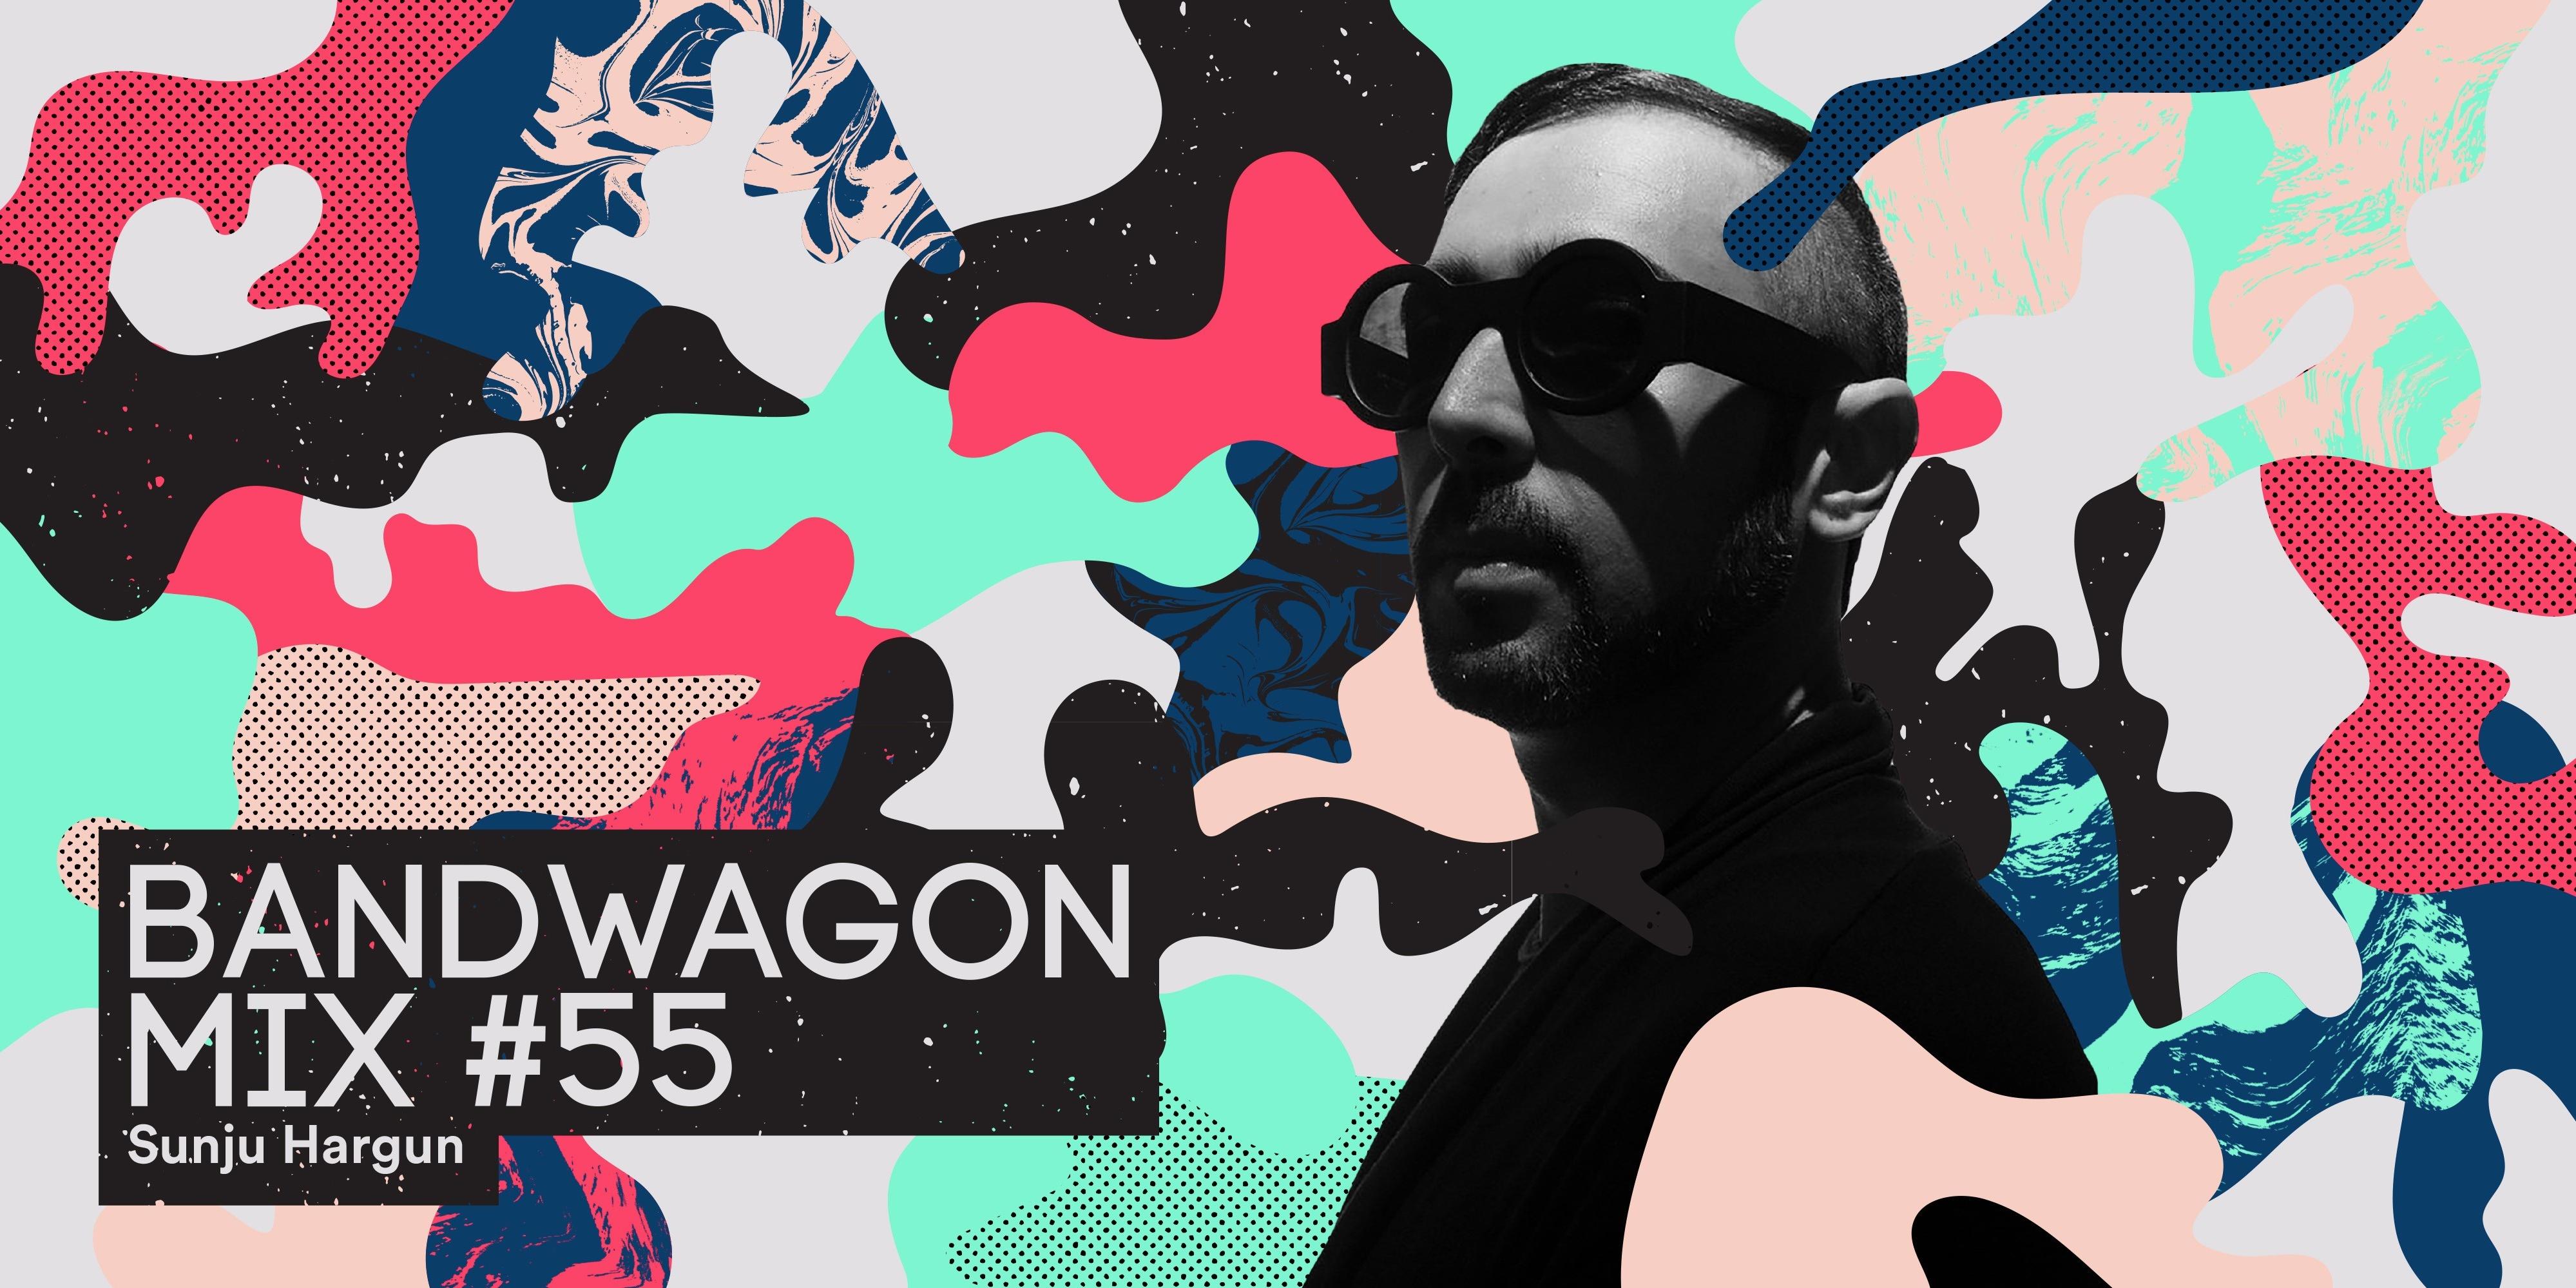 Bandwagon Mix #55: Sunju Hargun